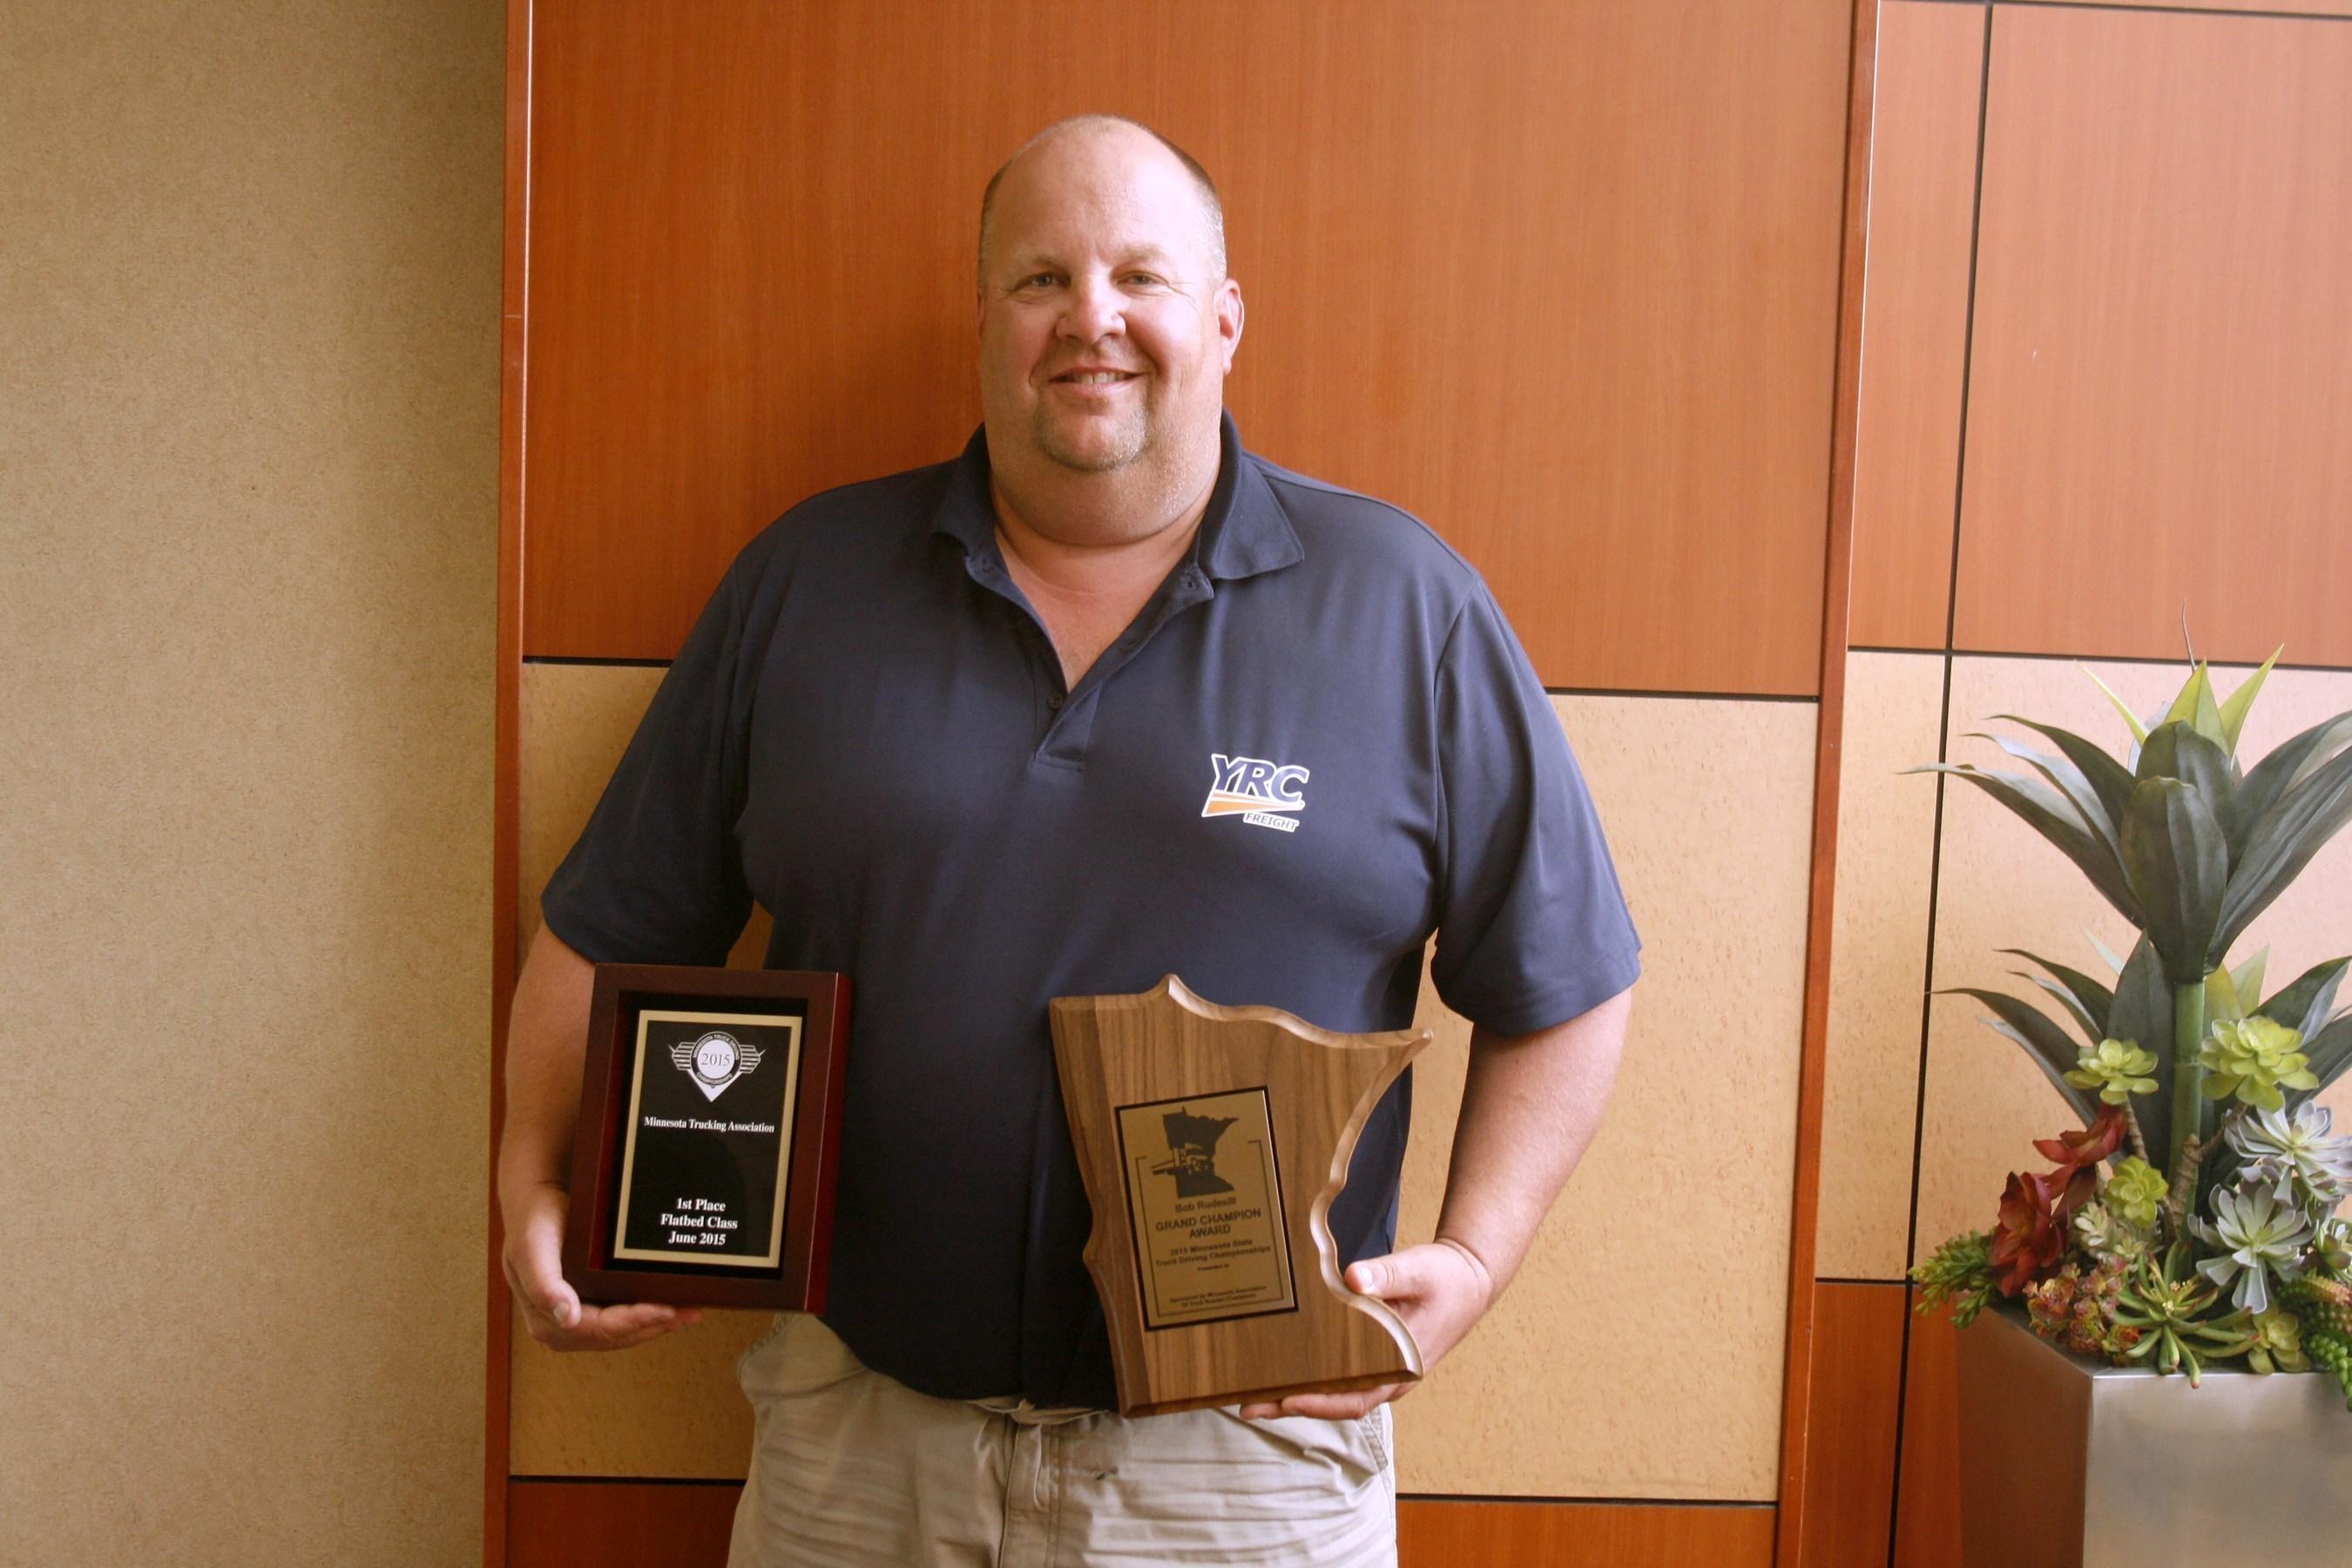 Bill Krouse Named 2015 Grand Champion At Minnesota Truck